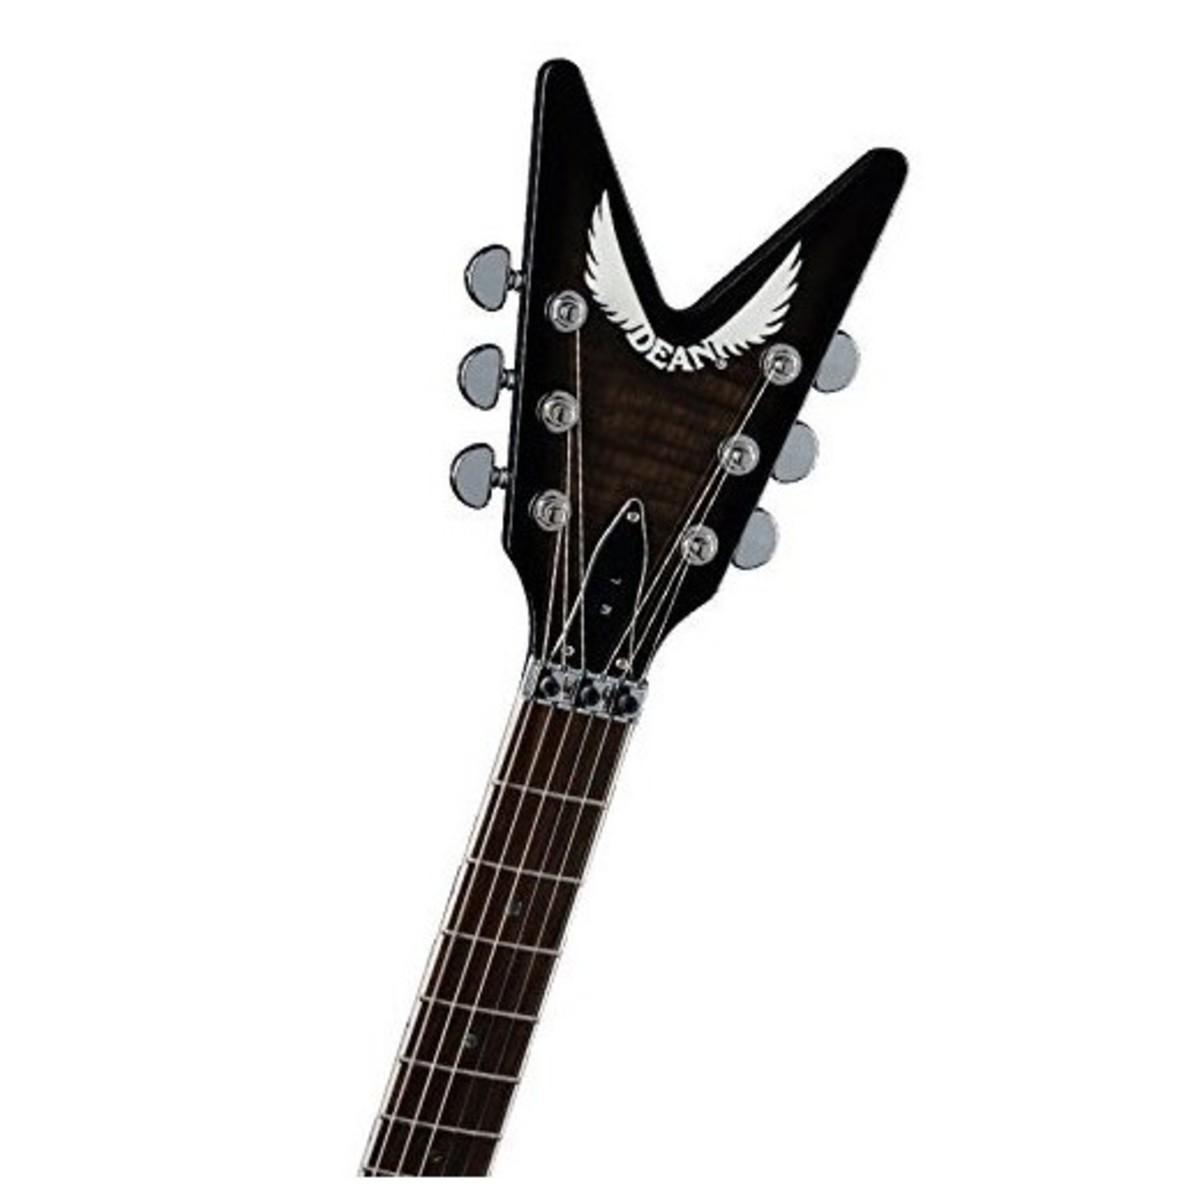 Dean Ml 79 Floyd Electric Guitar Trans Black B Stock At Gear4music